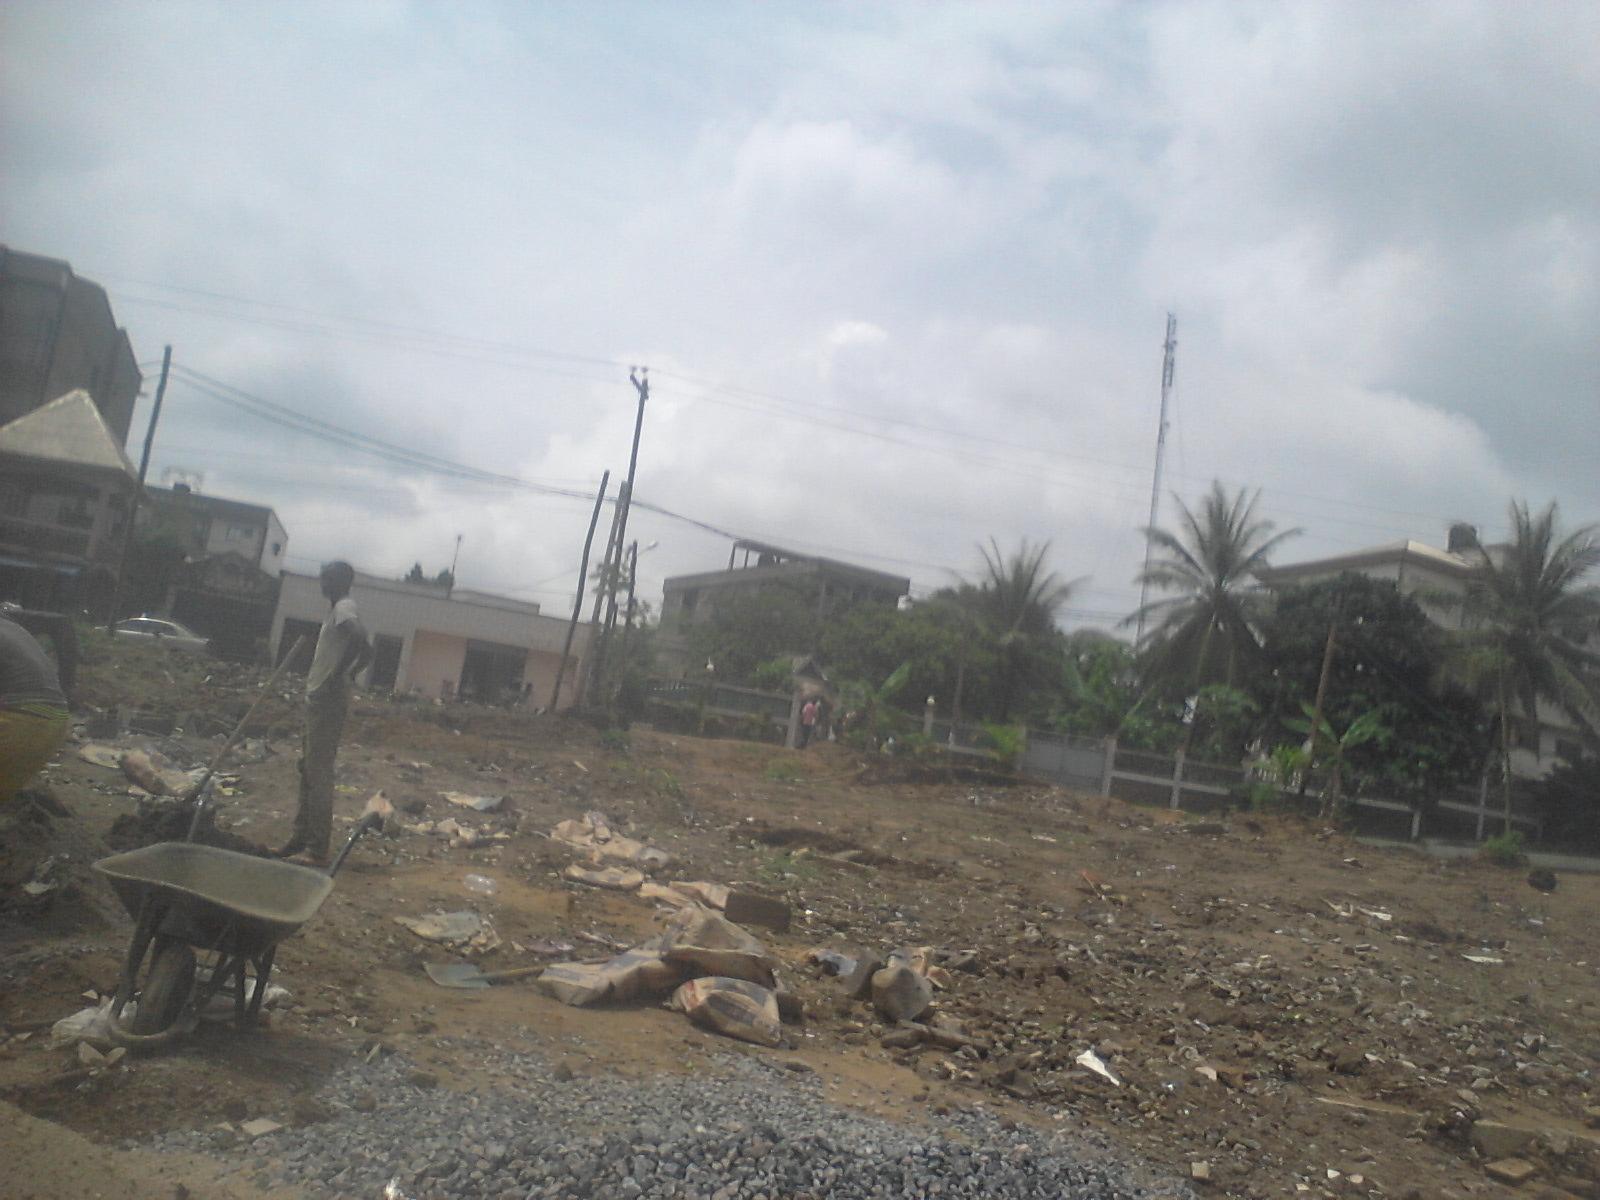 Land for sale at Douala, Akwa I, ndogbong - 210 m2 - 11 000 000 FCFA